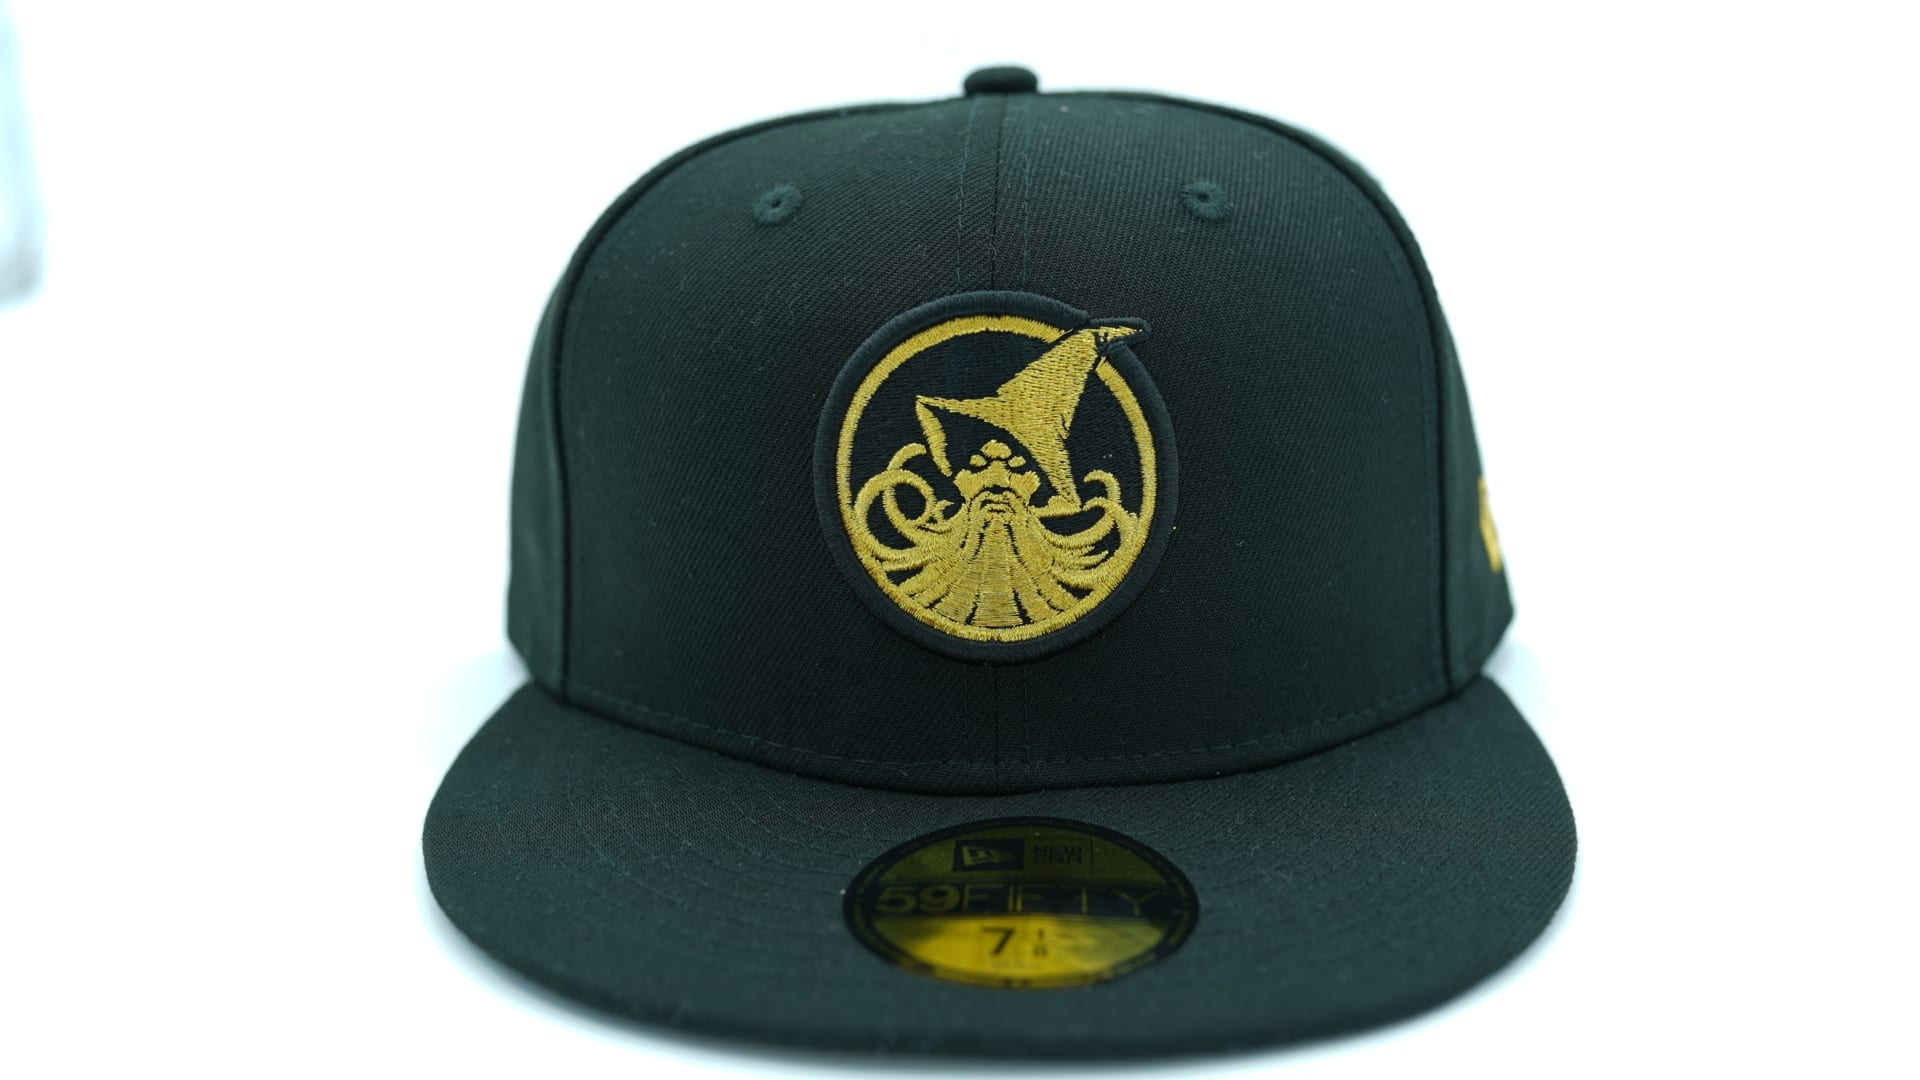 27d5b50c902ce new era custom boston red sox green gold 59fifty fitted baseball cap 1